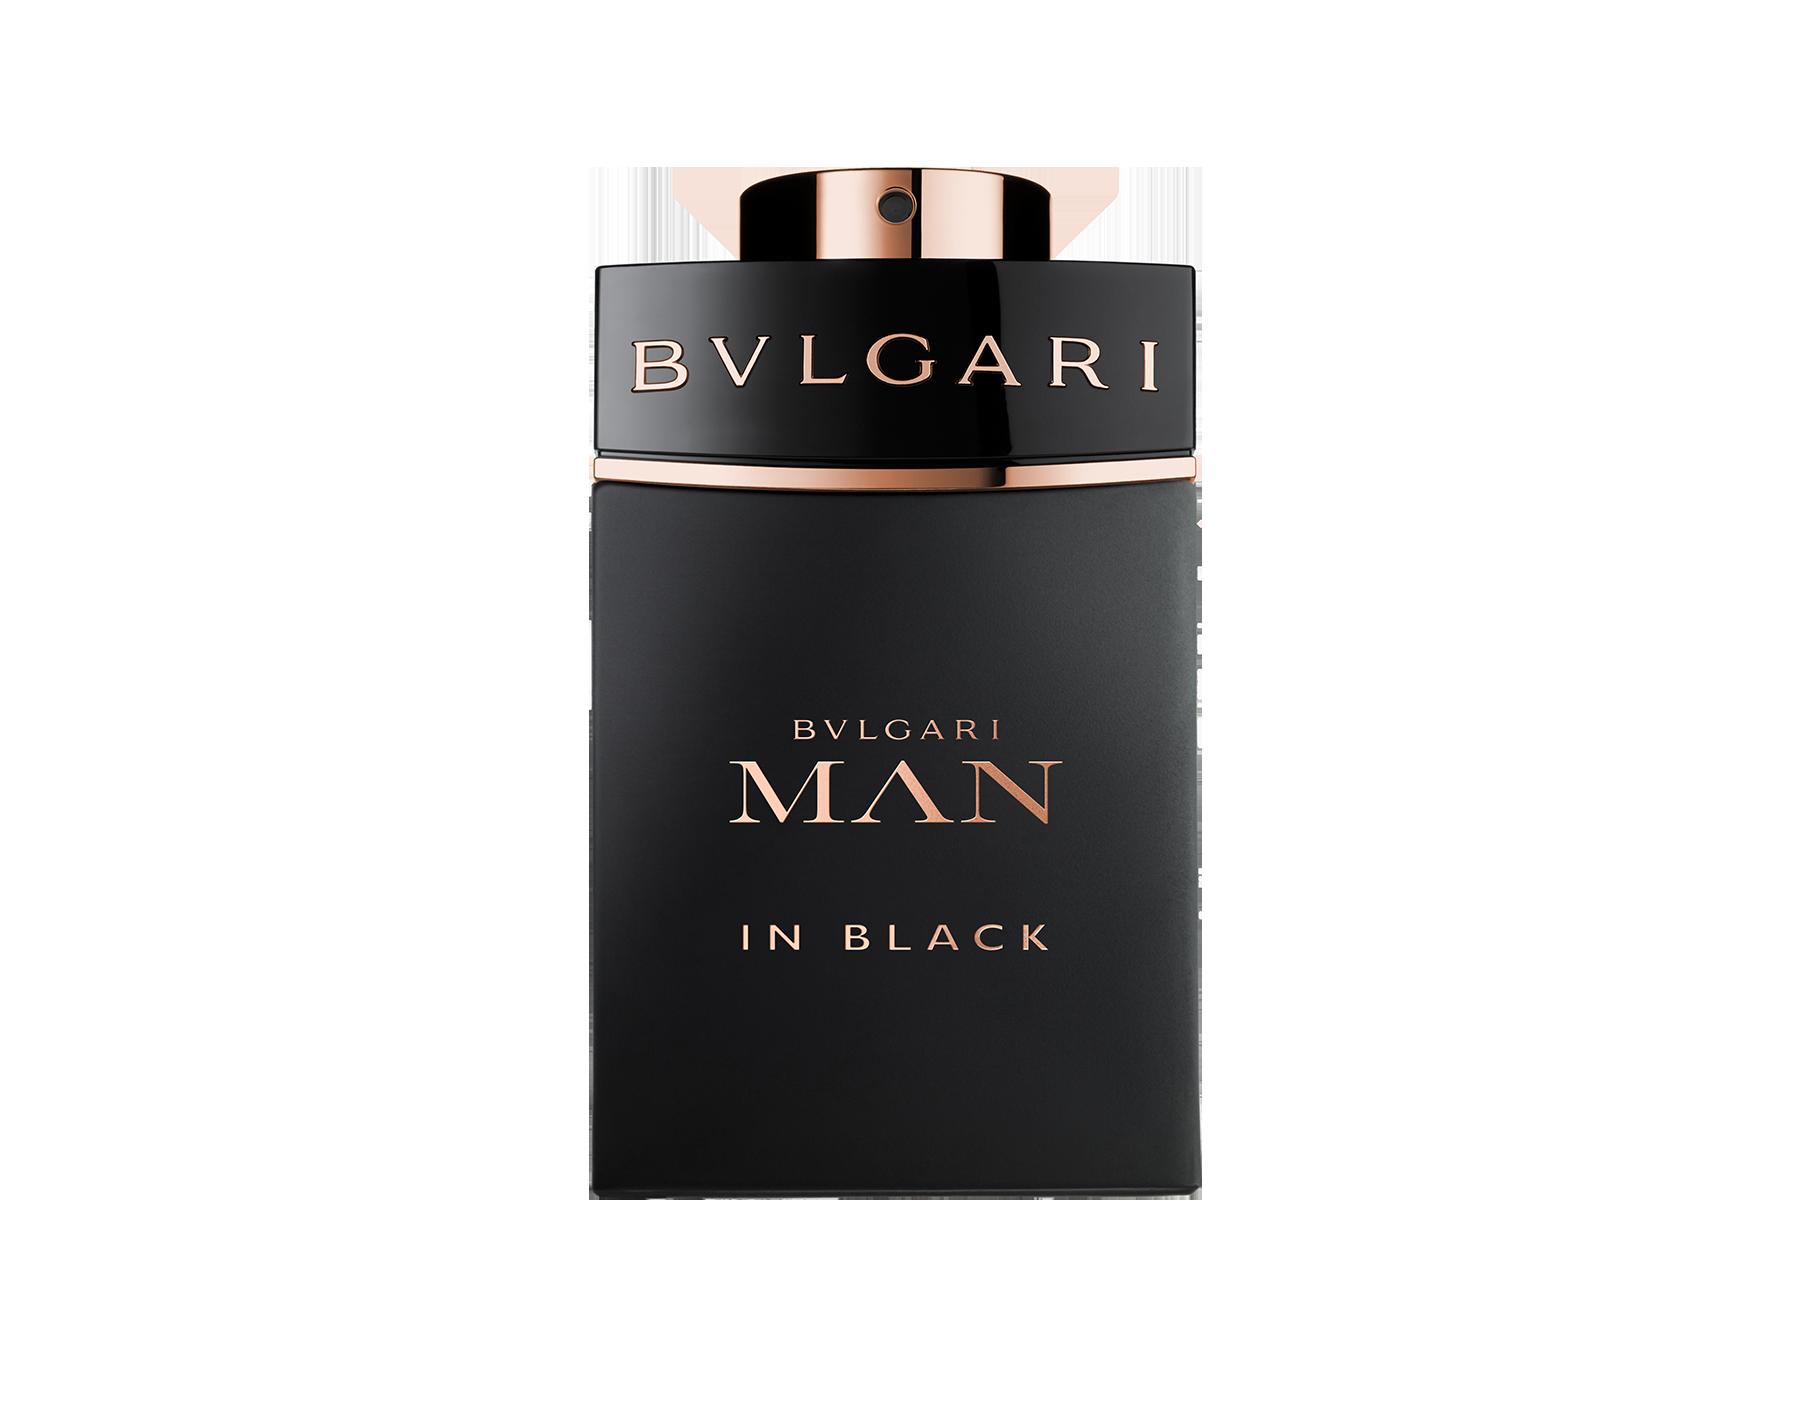 BVLGARI MAN IN BLACK Eau de Parfum Spray 100ml.